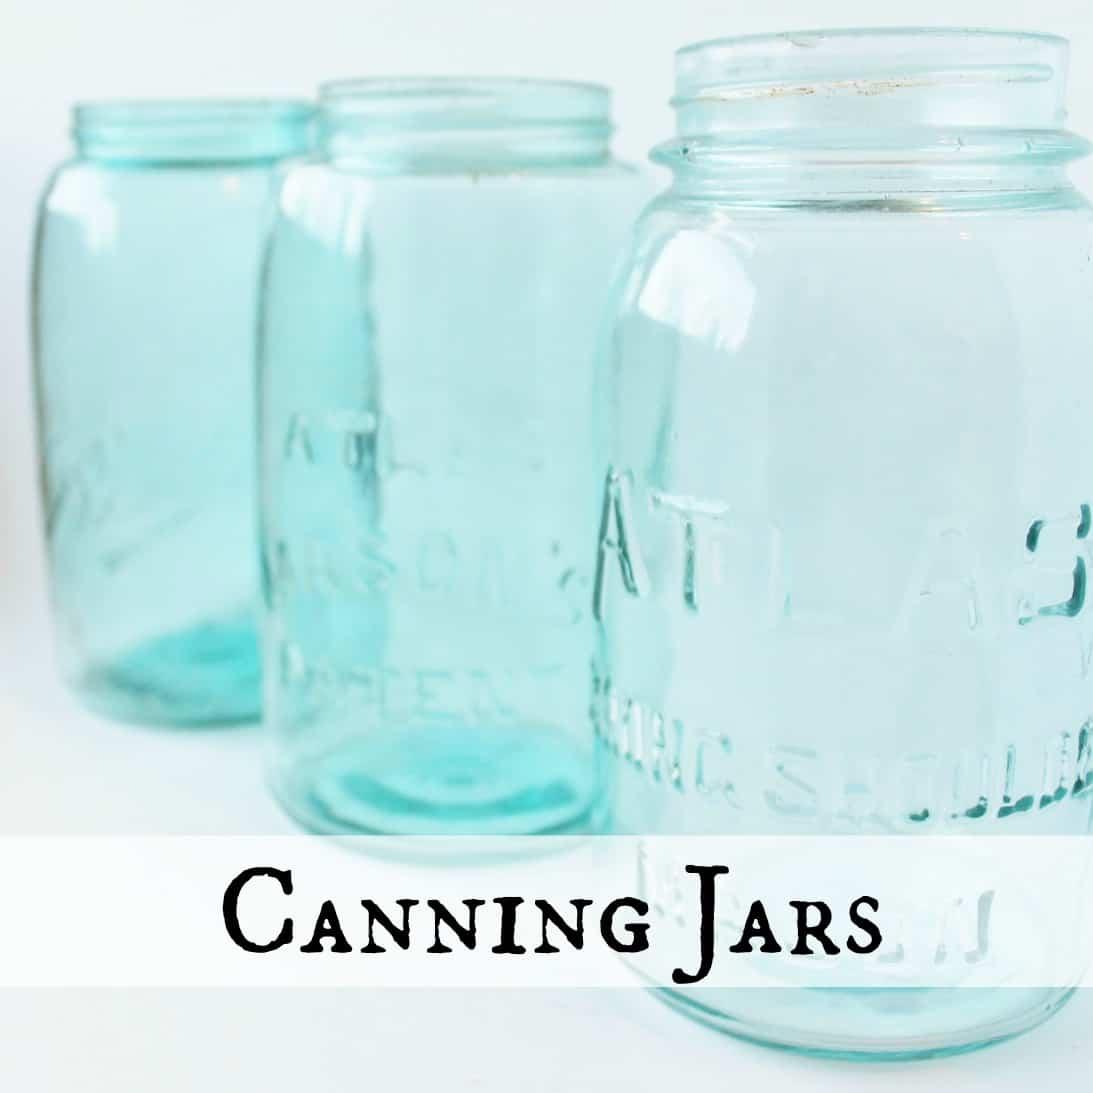 Antique Vintage Canning Jar Price Guide Adirondack Girl Heart